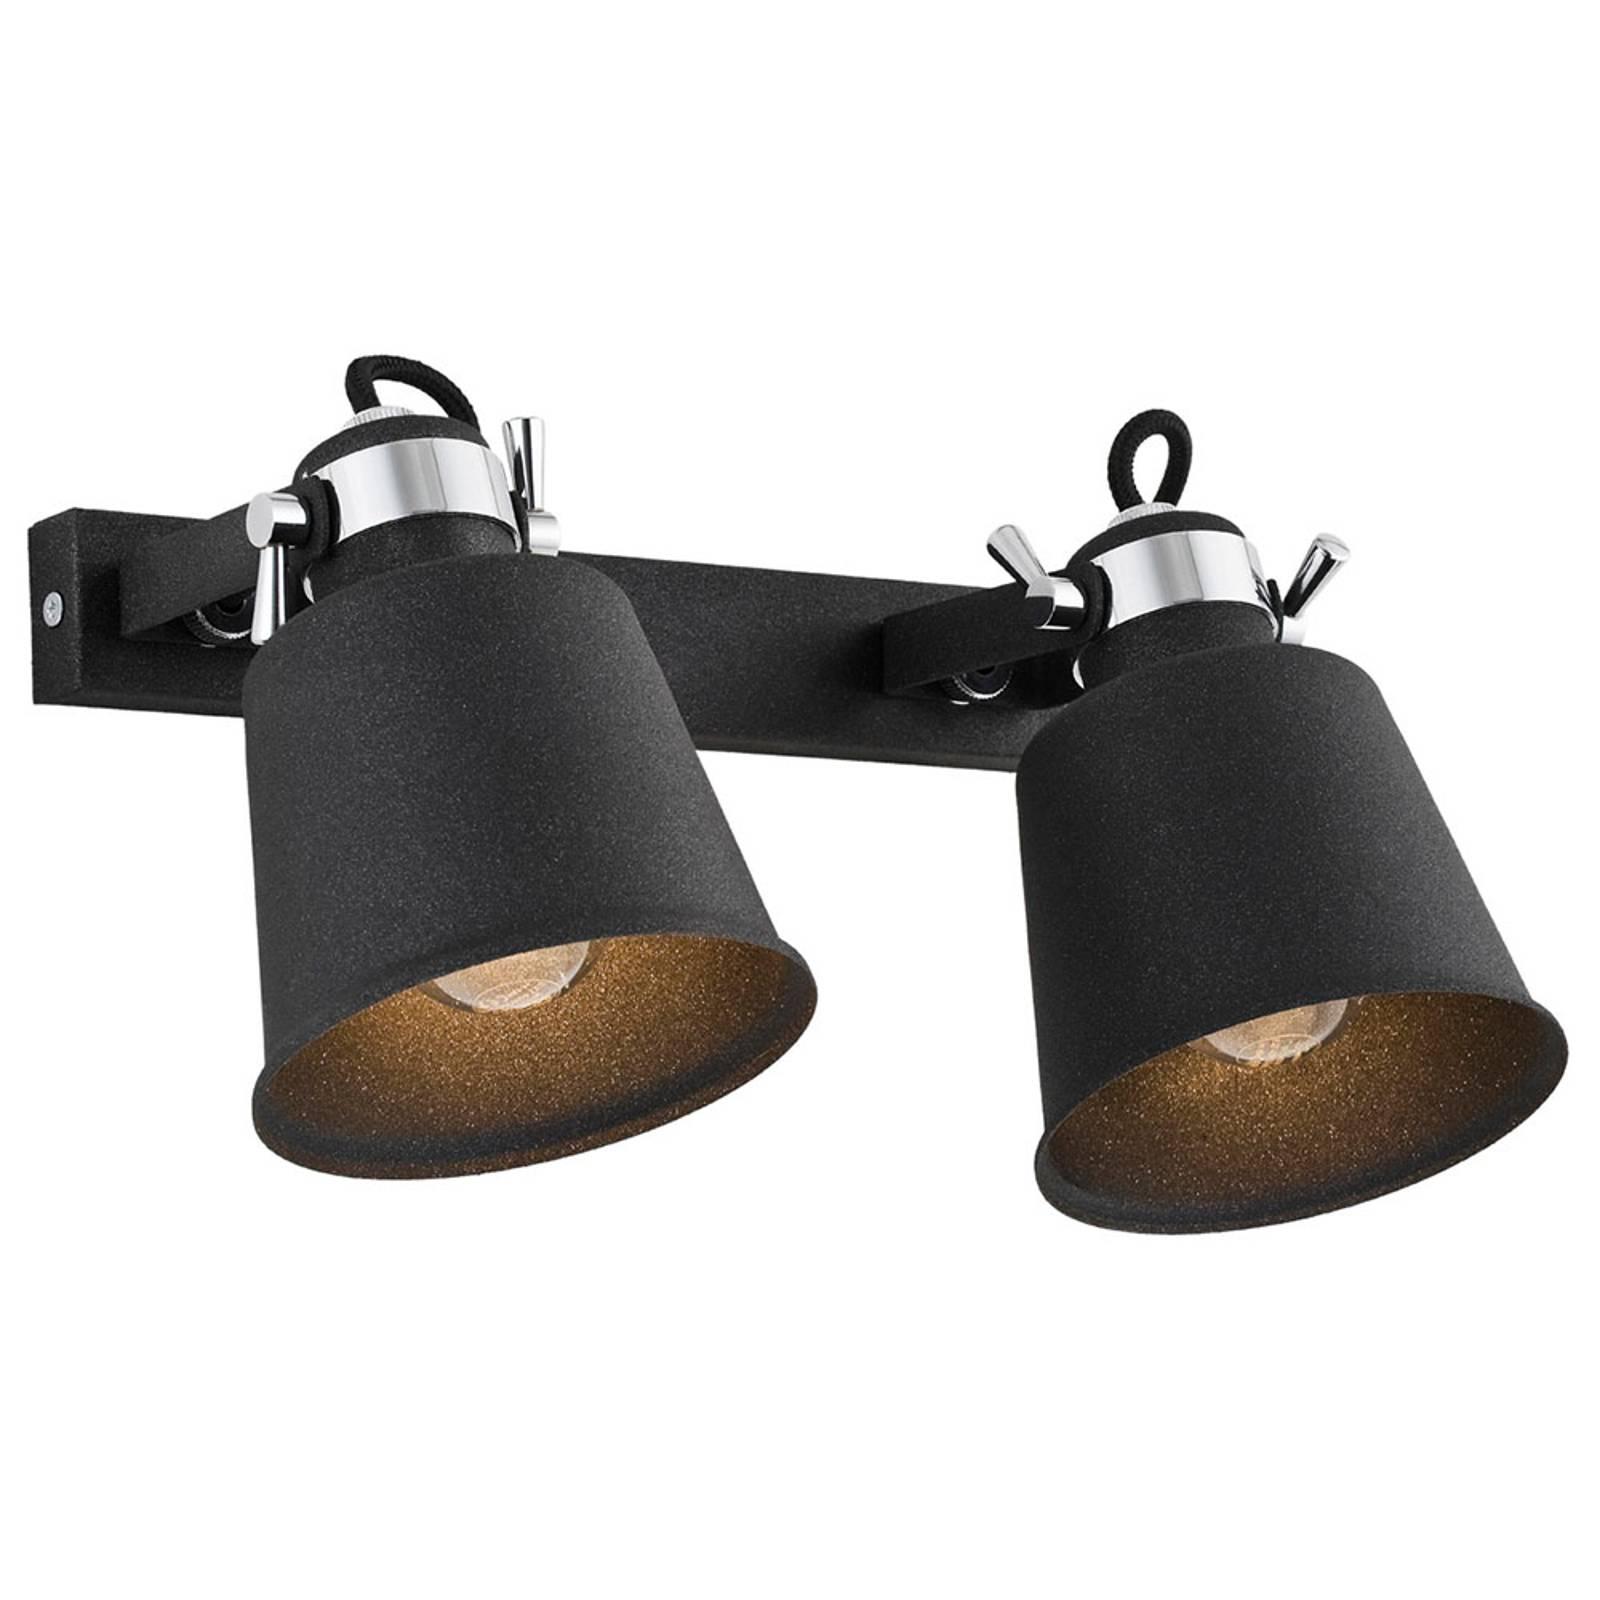 Wandstrahler Kerava, zweiflammig, schwarz